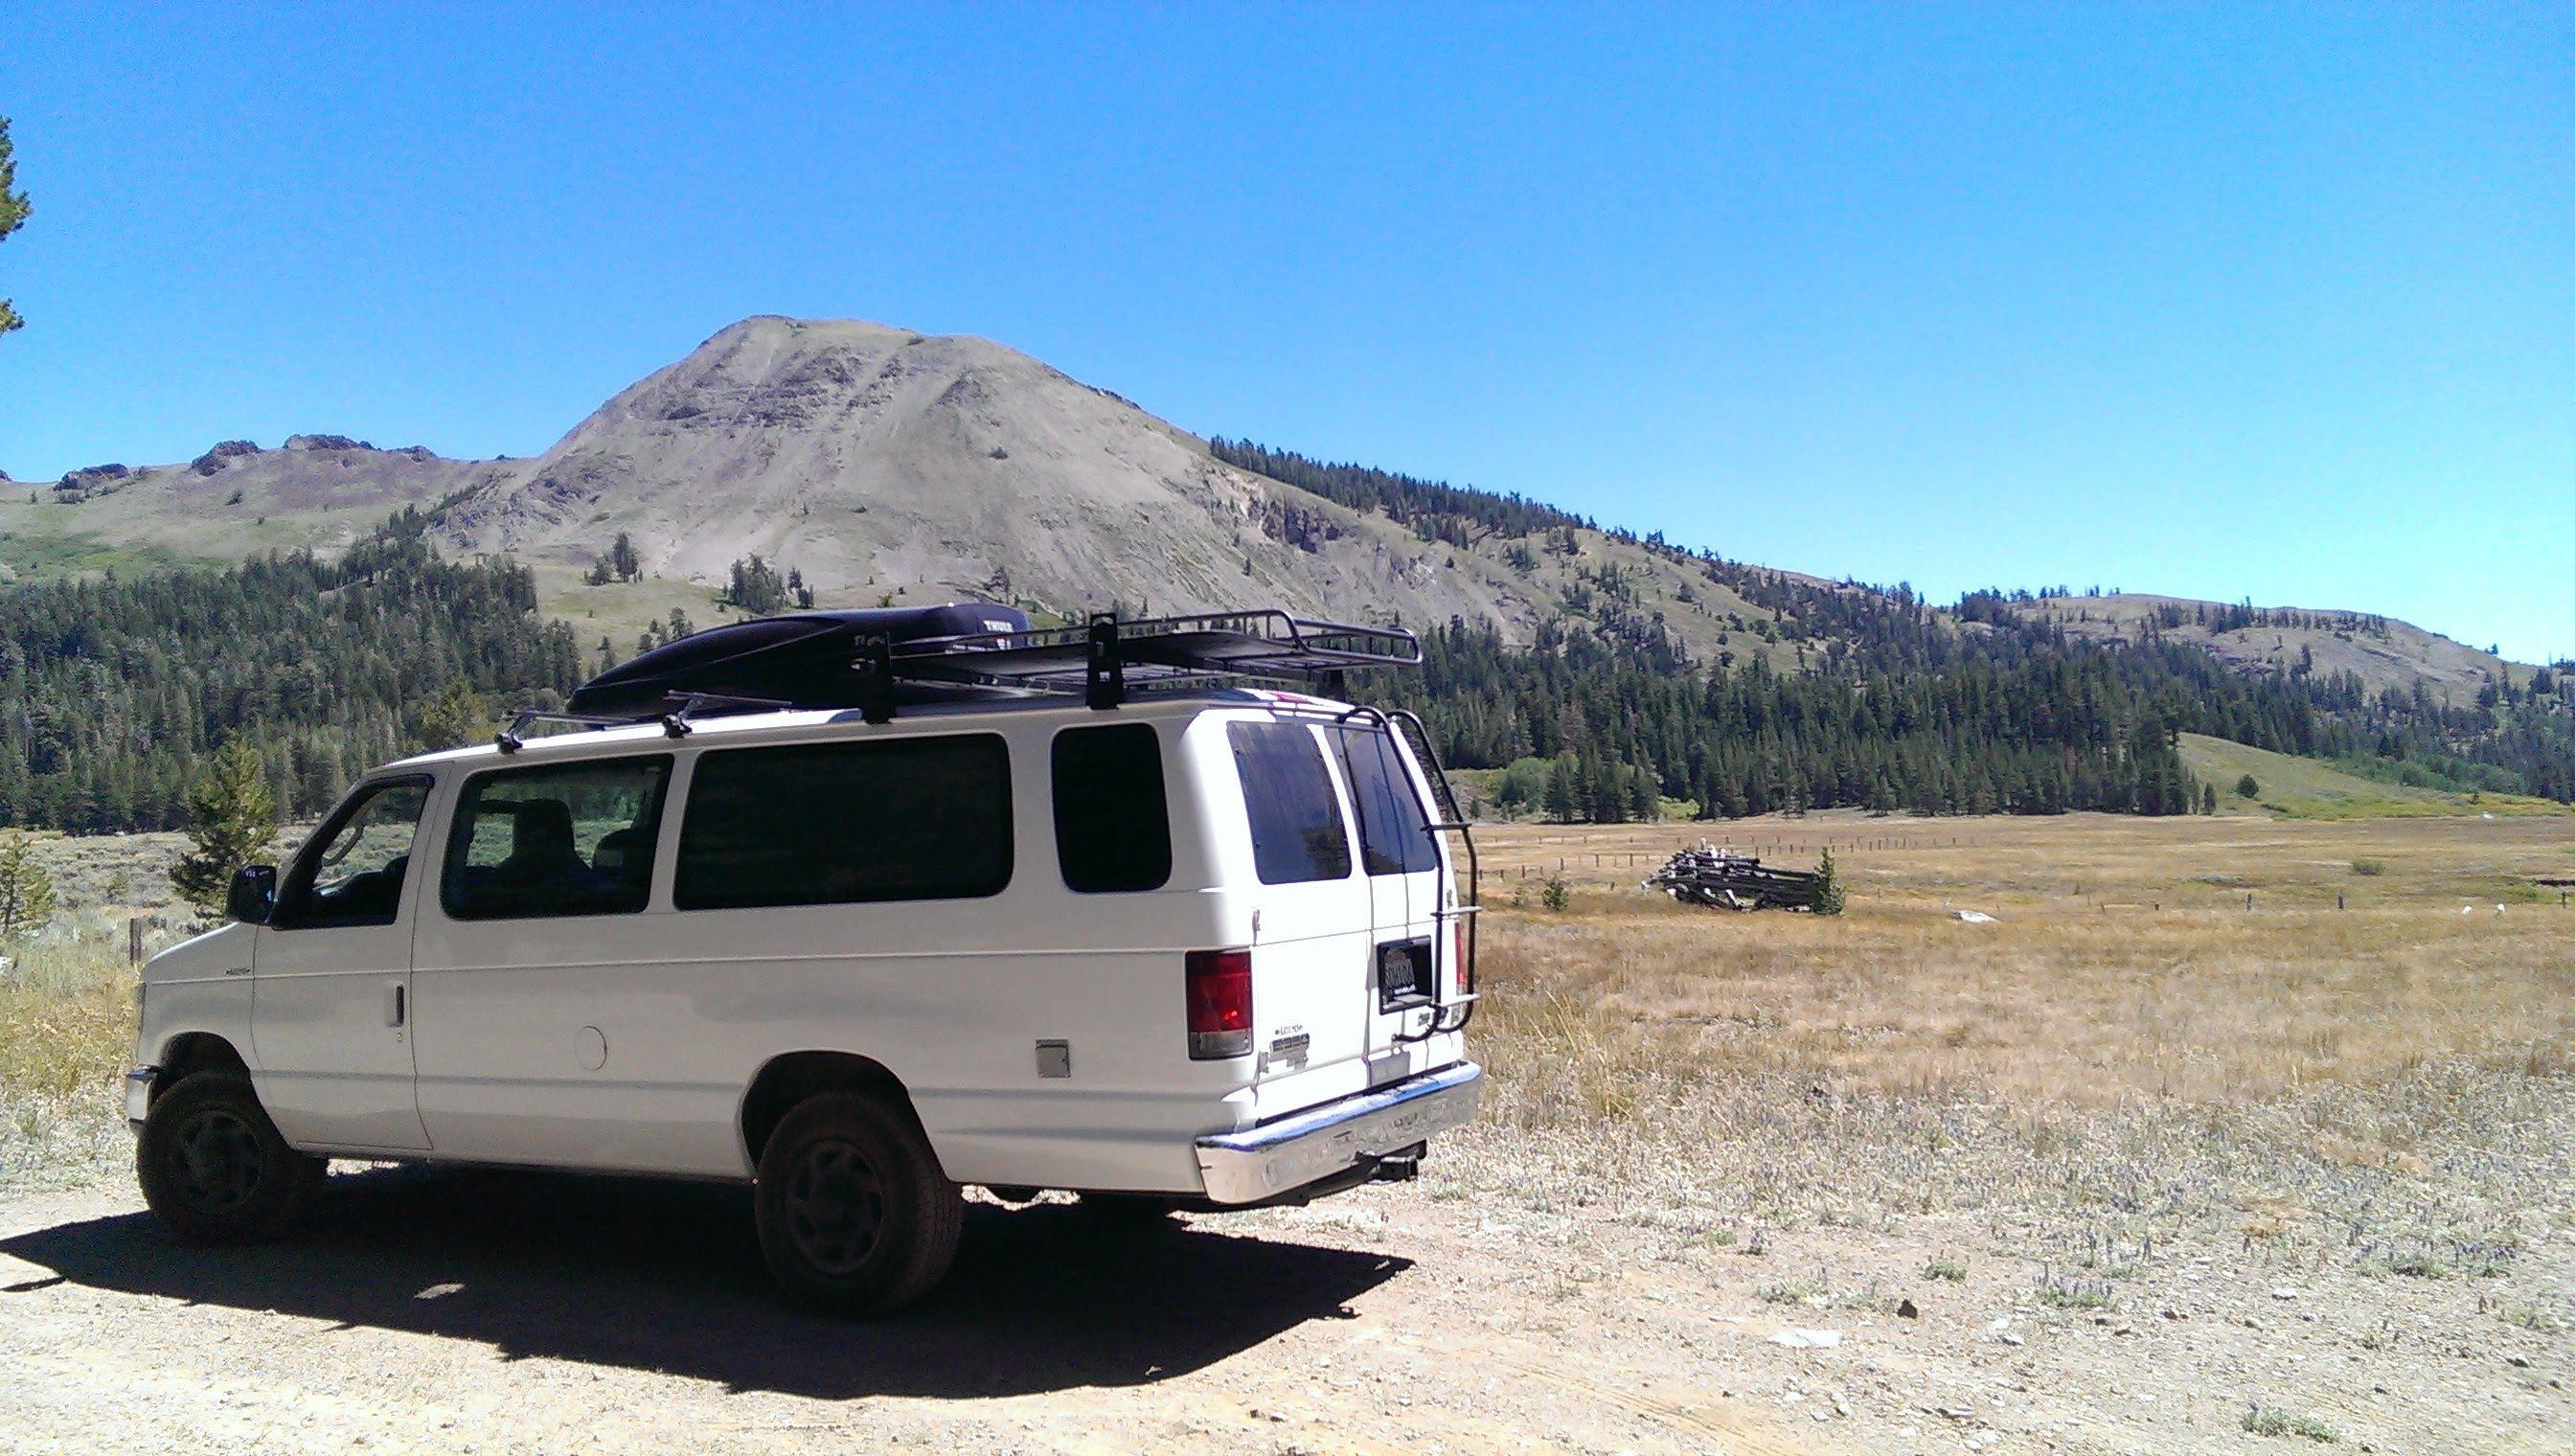 My Diy Self Built Conversion Camper X2f Sleeper X2f Recreational